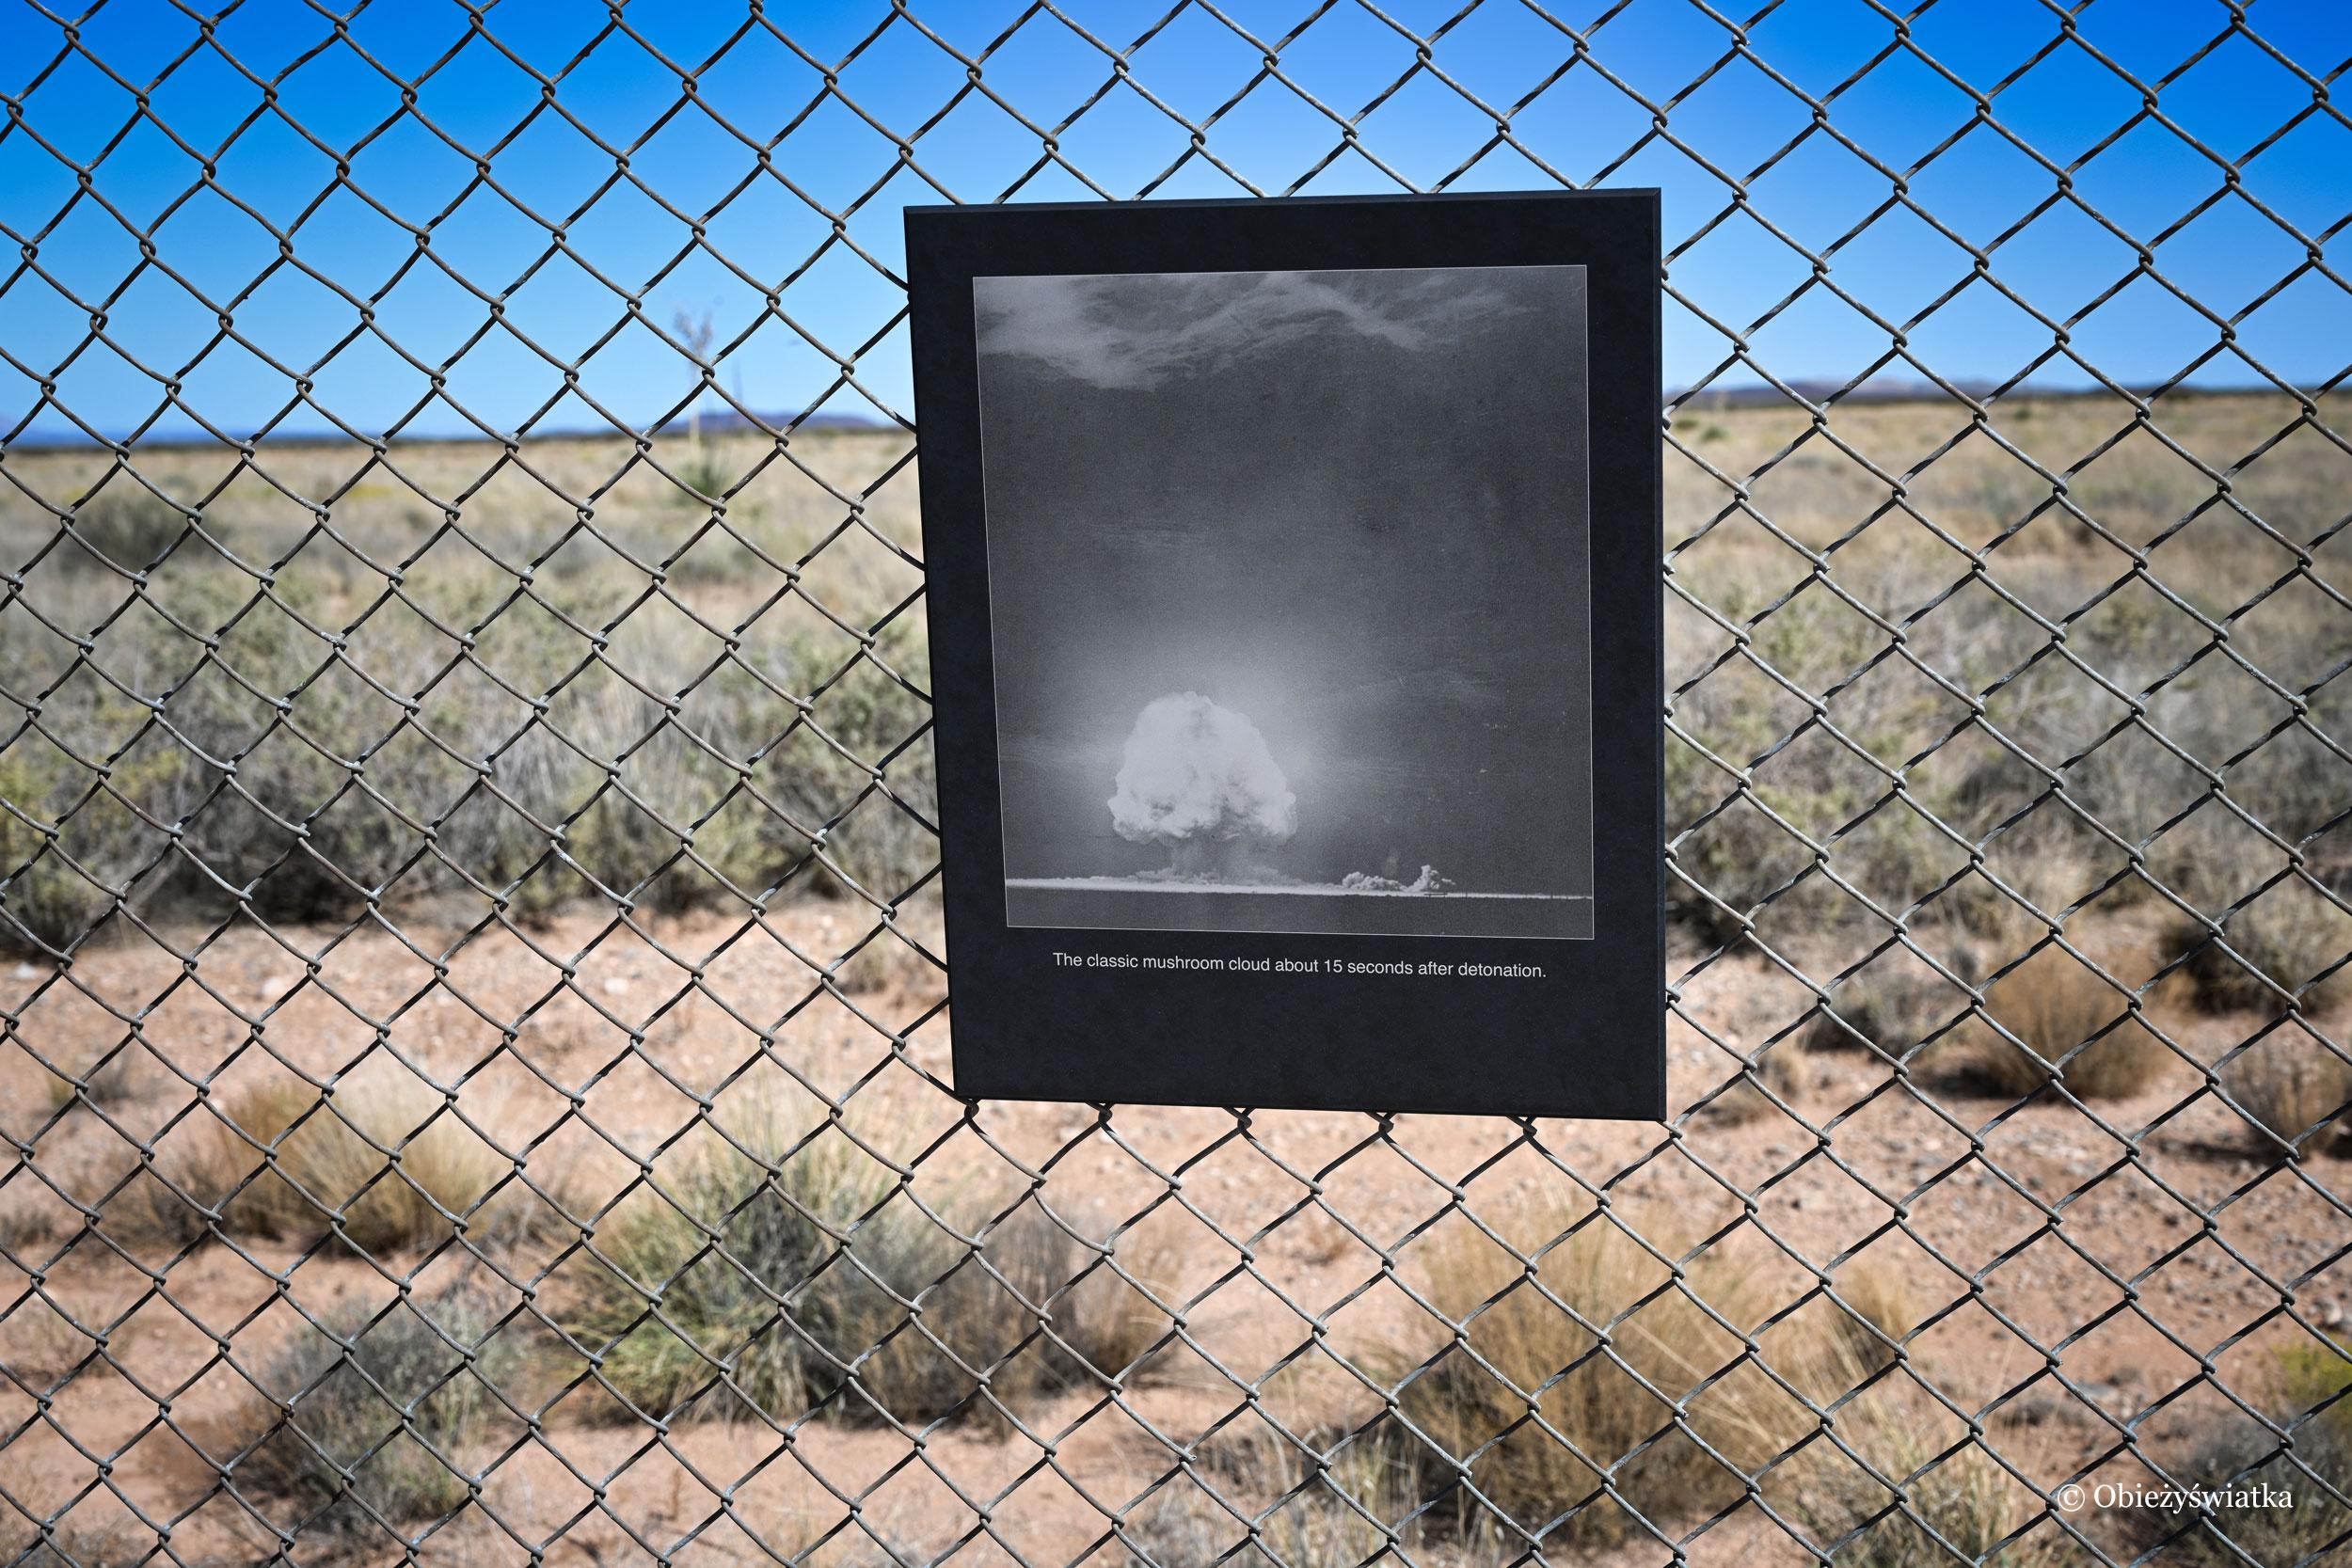 Strefa 0, Trinity Test Site, USA